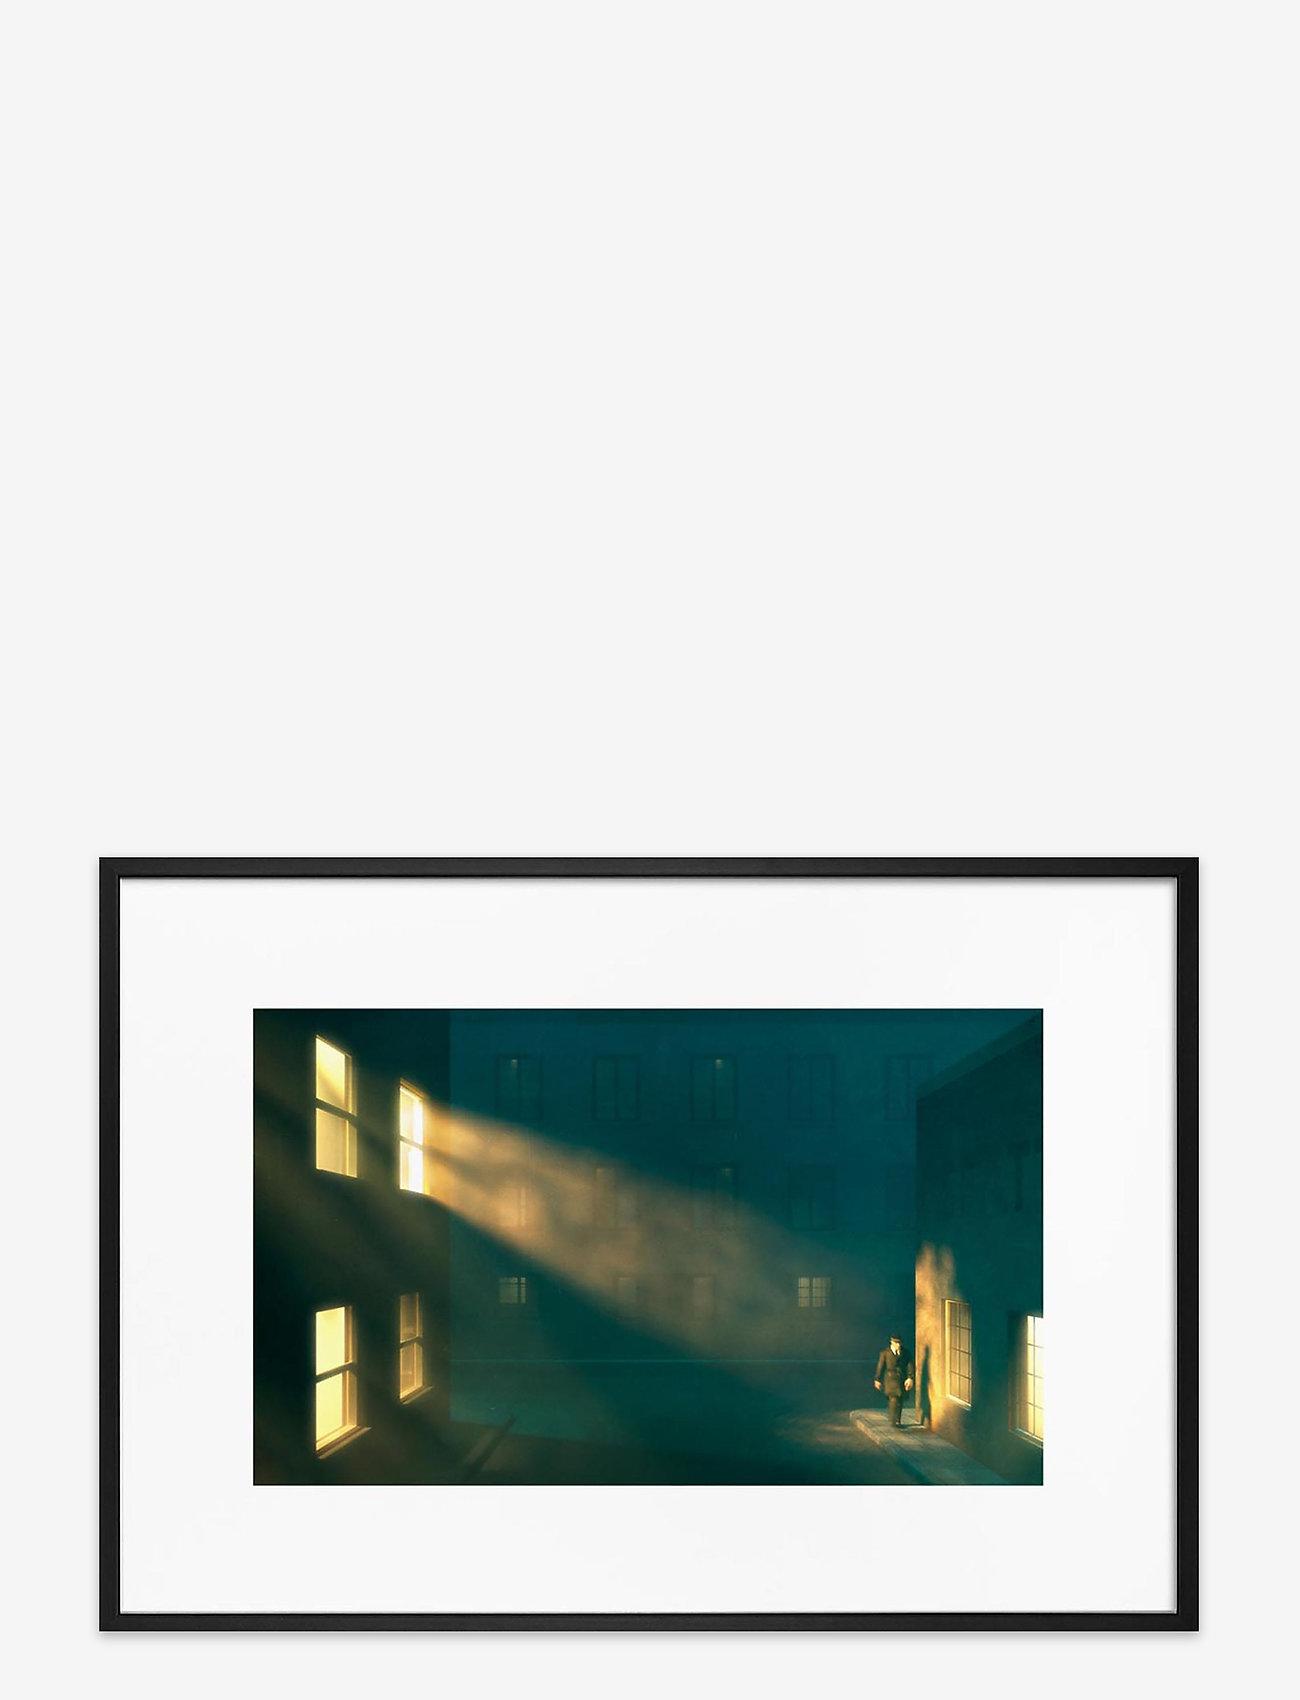 Democratic Gallery - Poster Film Noir No. 3 - home decor - green - 0